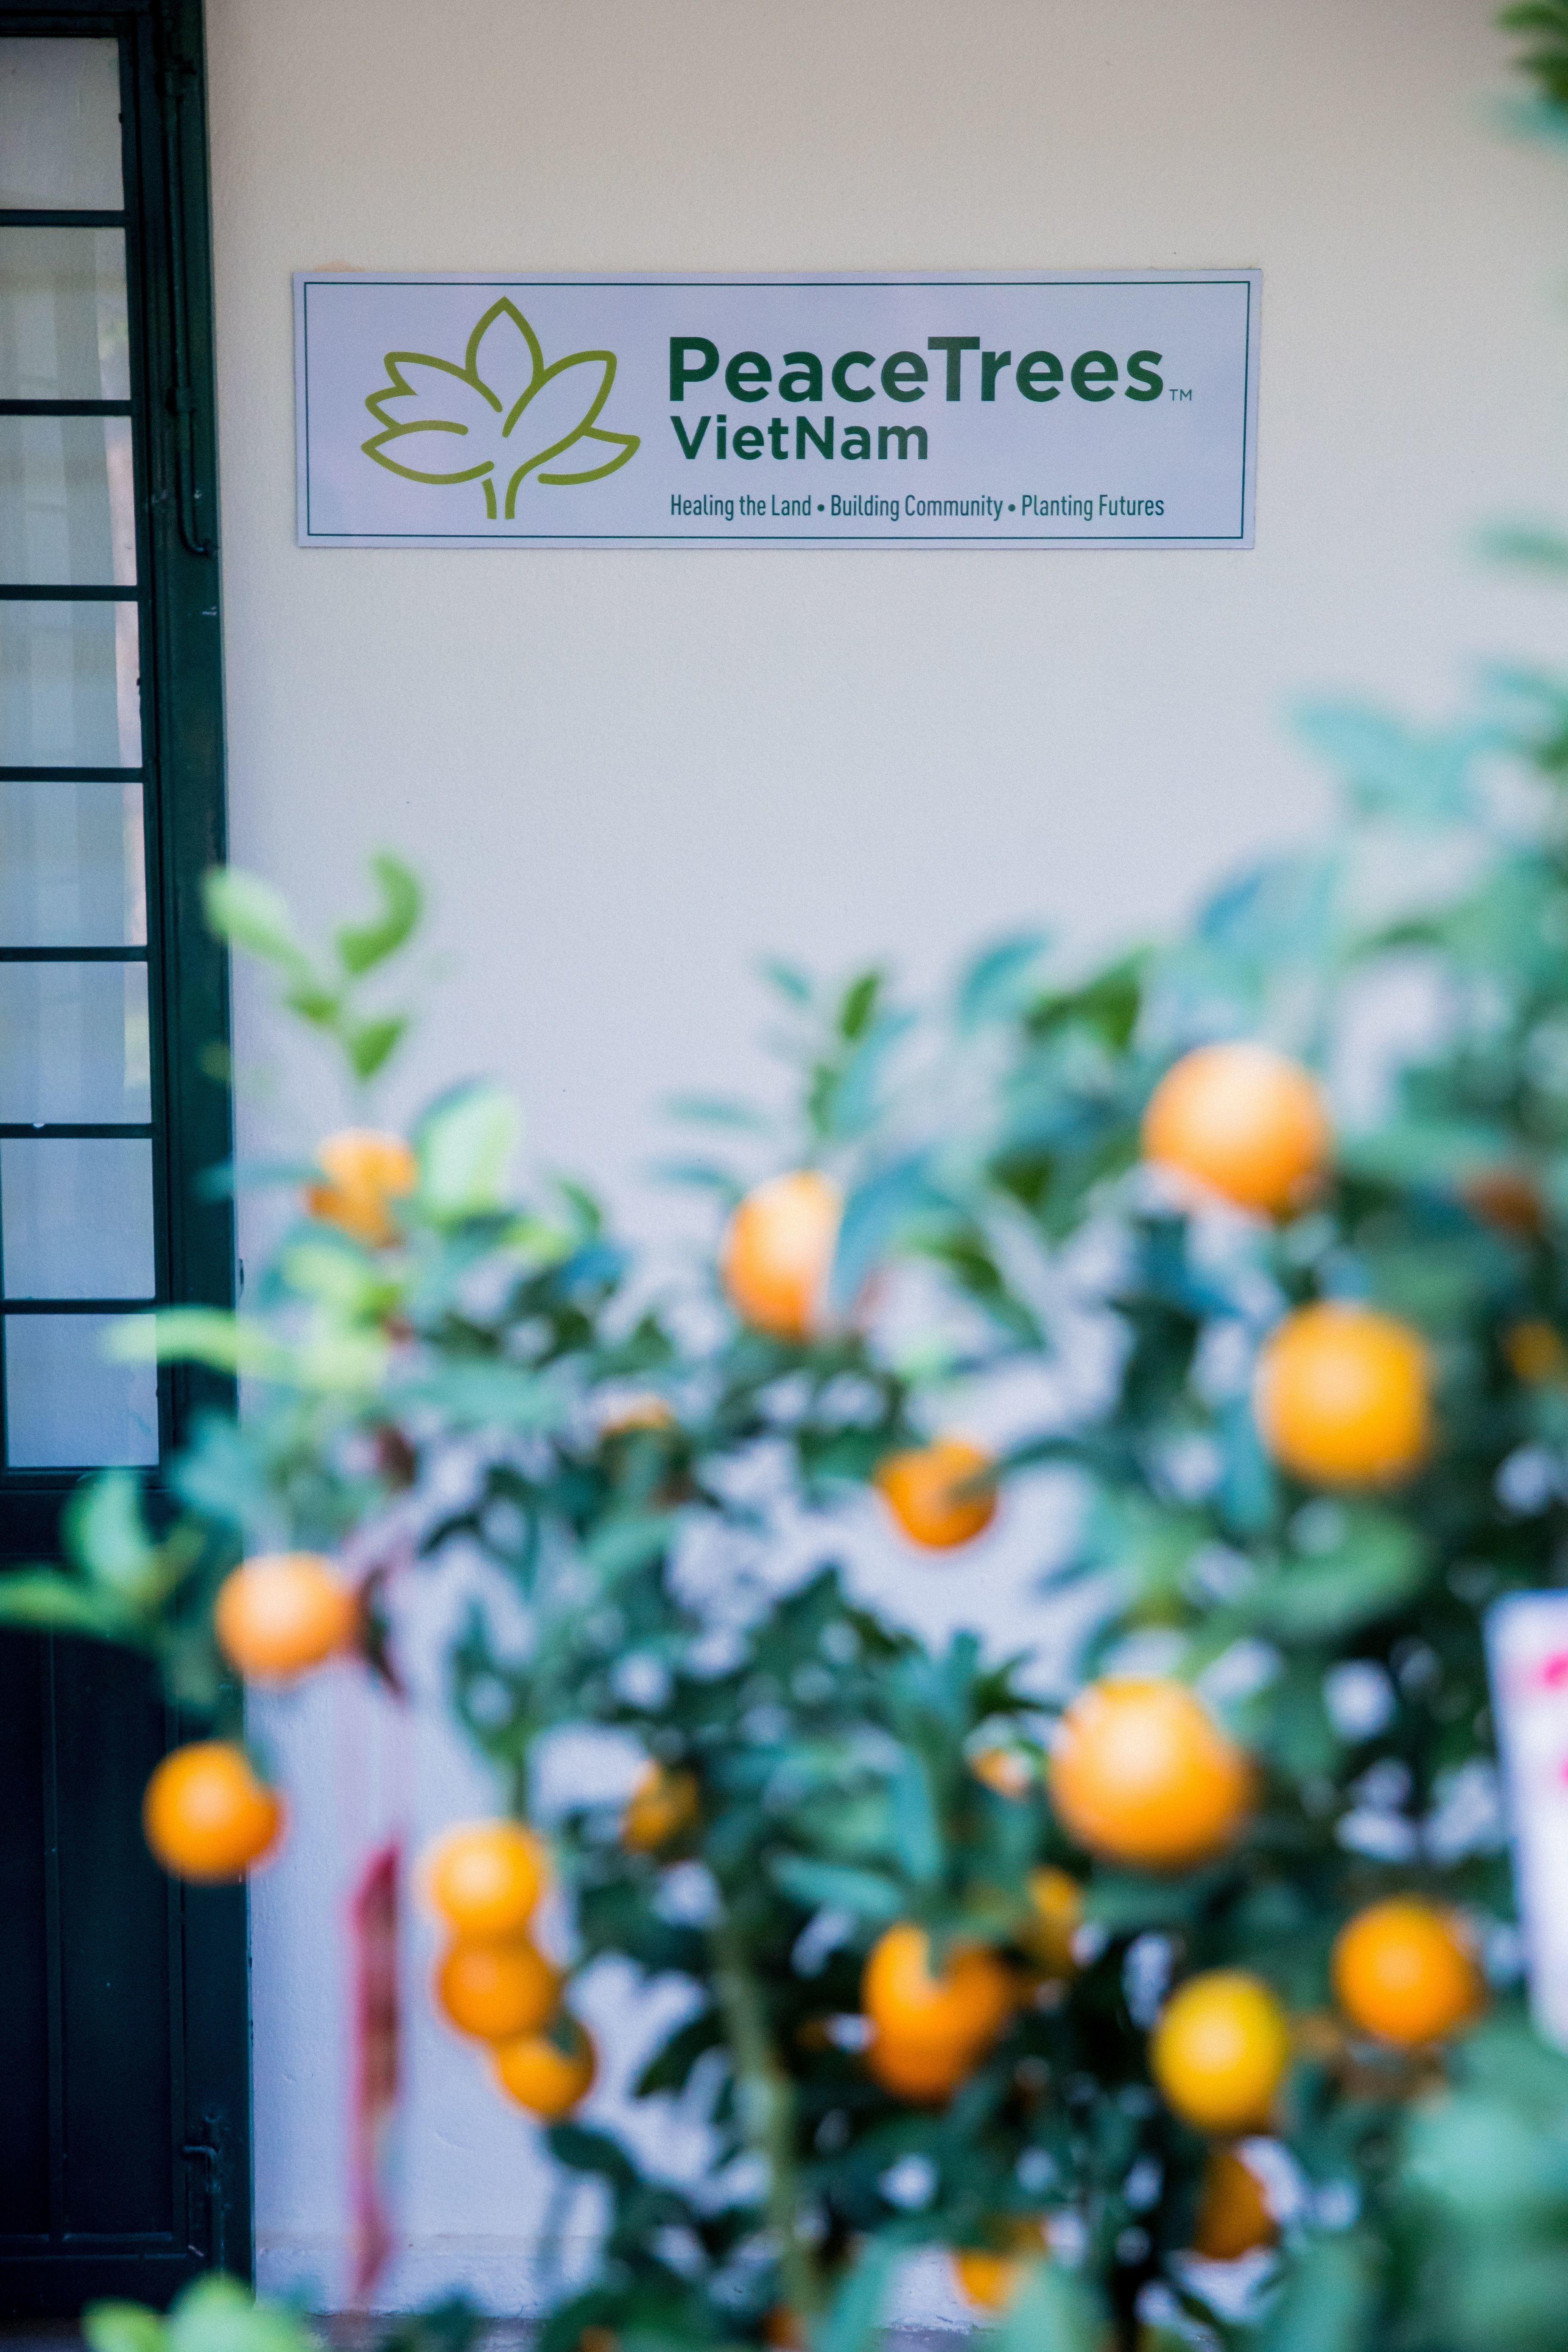 26 Years of Partnership and Peacebuilding in Vietnam